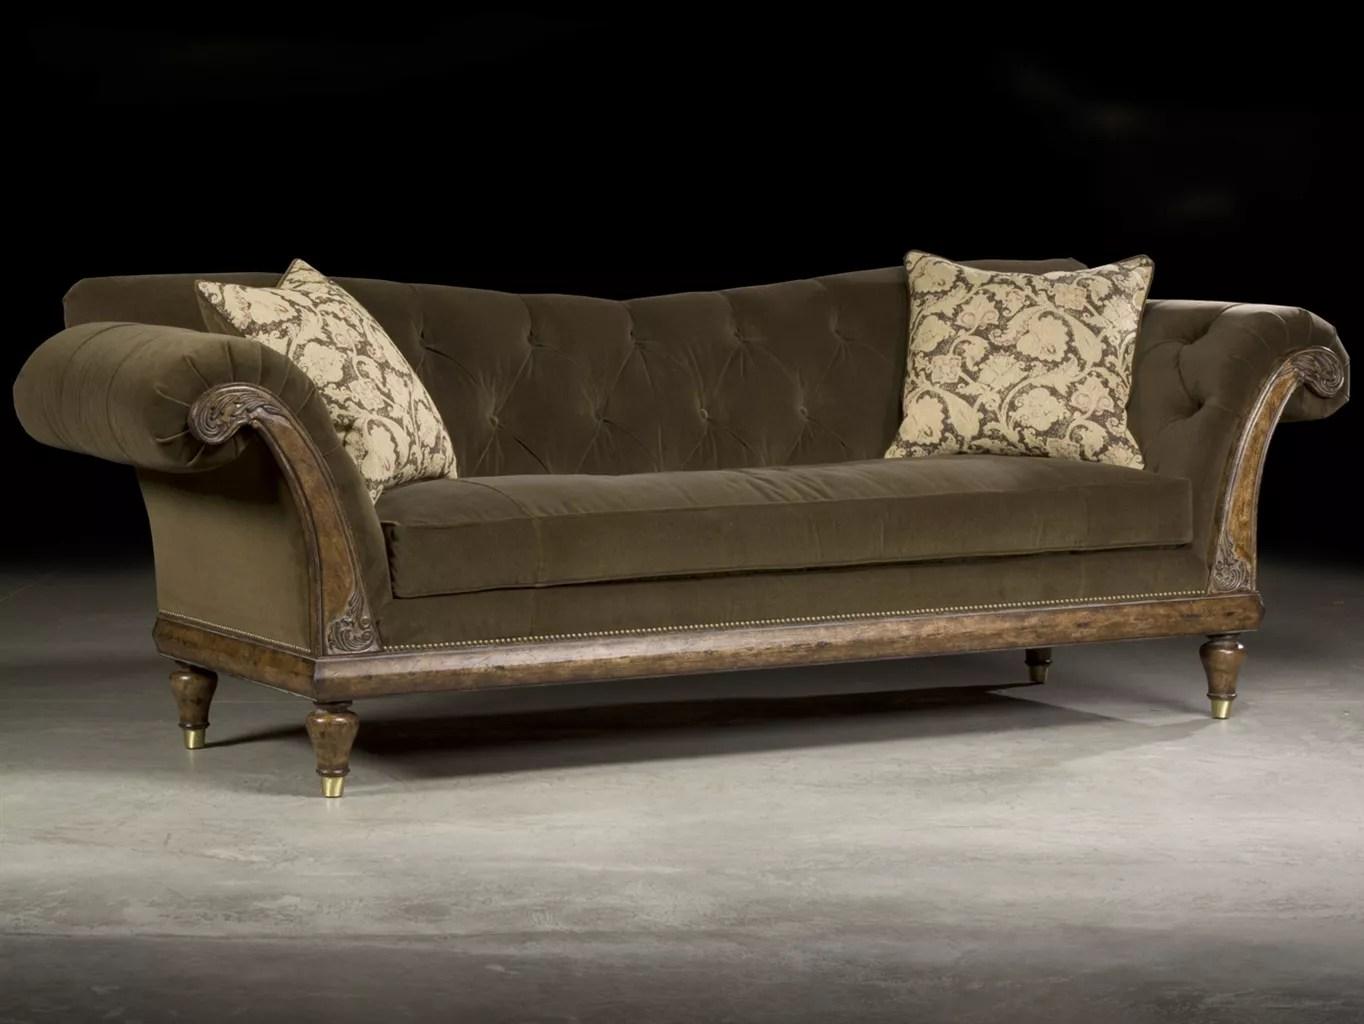 luxurious tufted velvet carved sofa luxurious decor